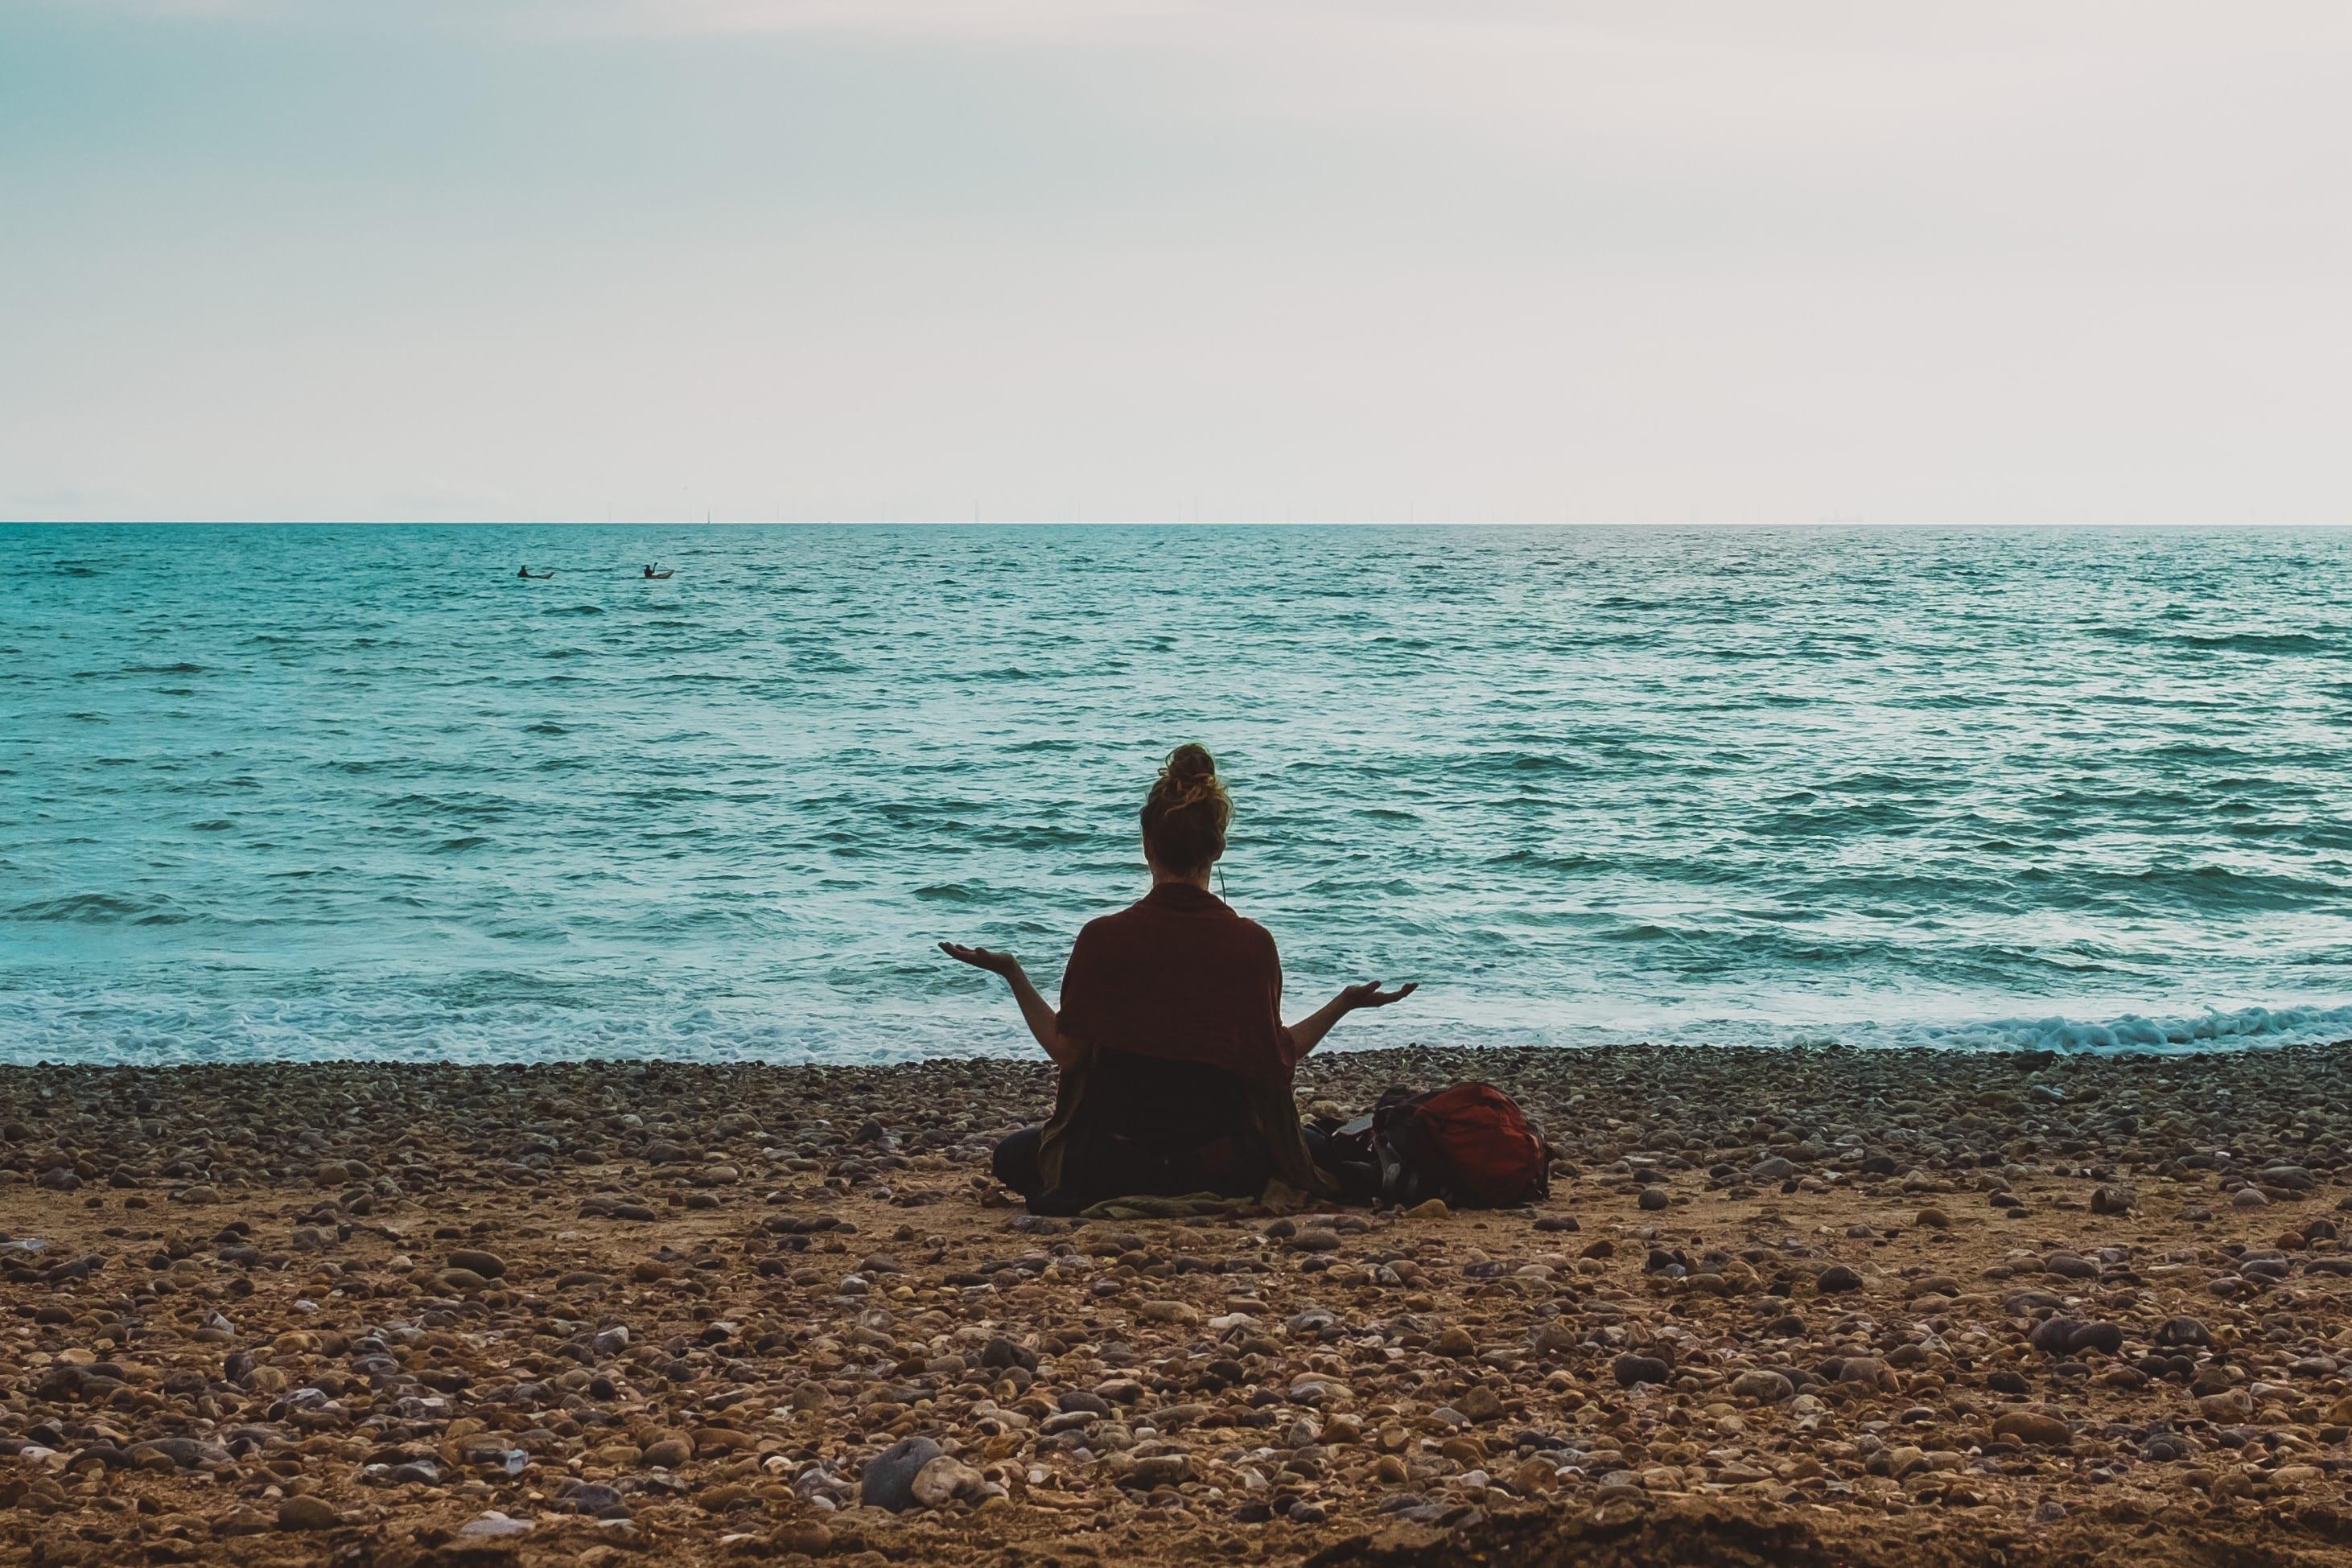 Woman meditating by a lakeshore; image by Dardan, via unsplash.com.